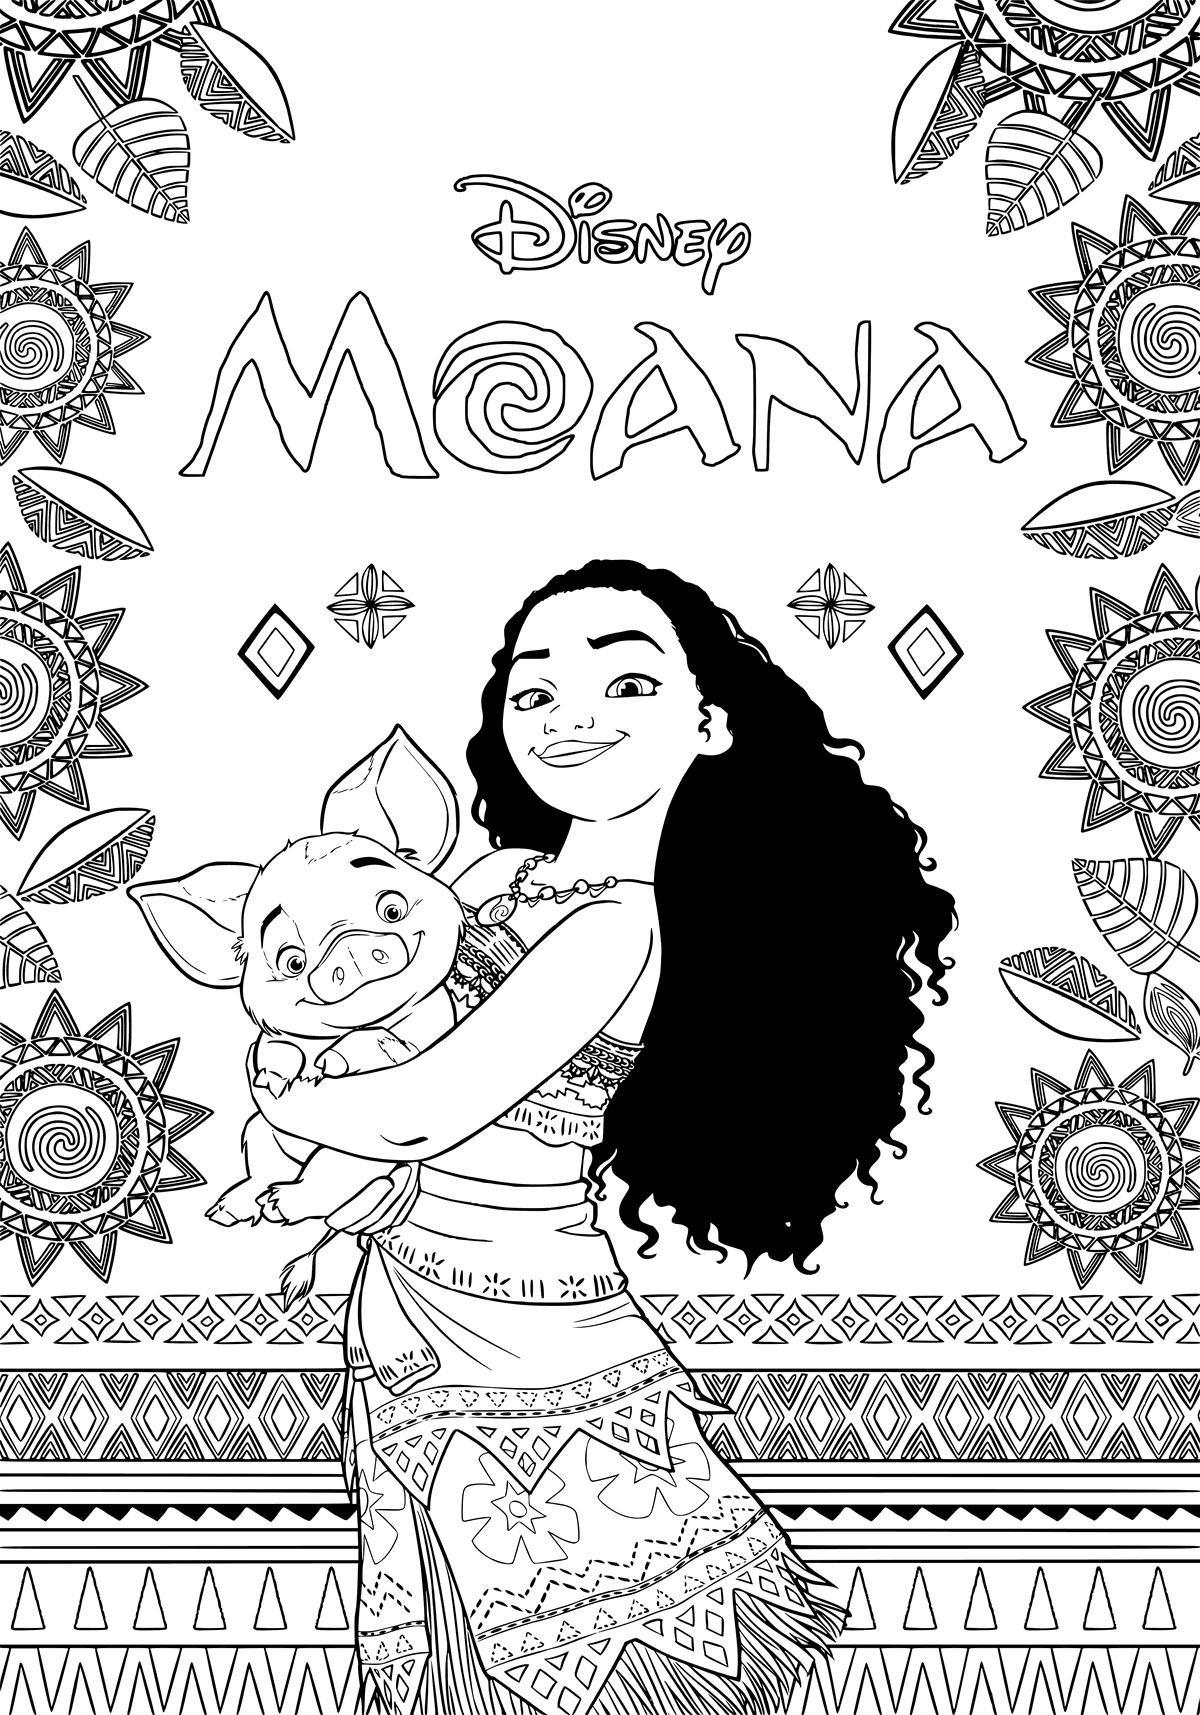 18 Coloring Page Moana Moana Coloring Pages Moana Coloring Princess Coloring Pages